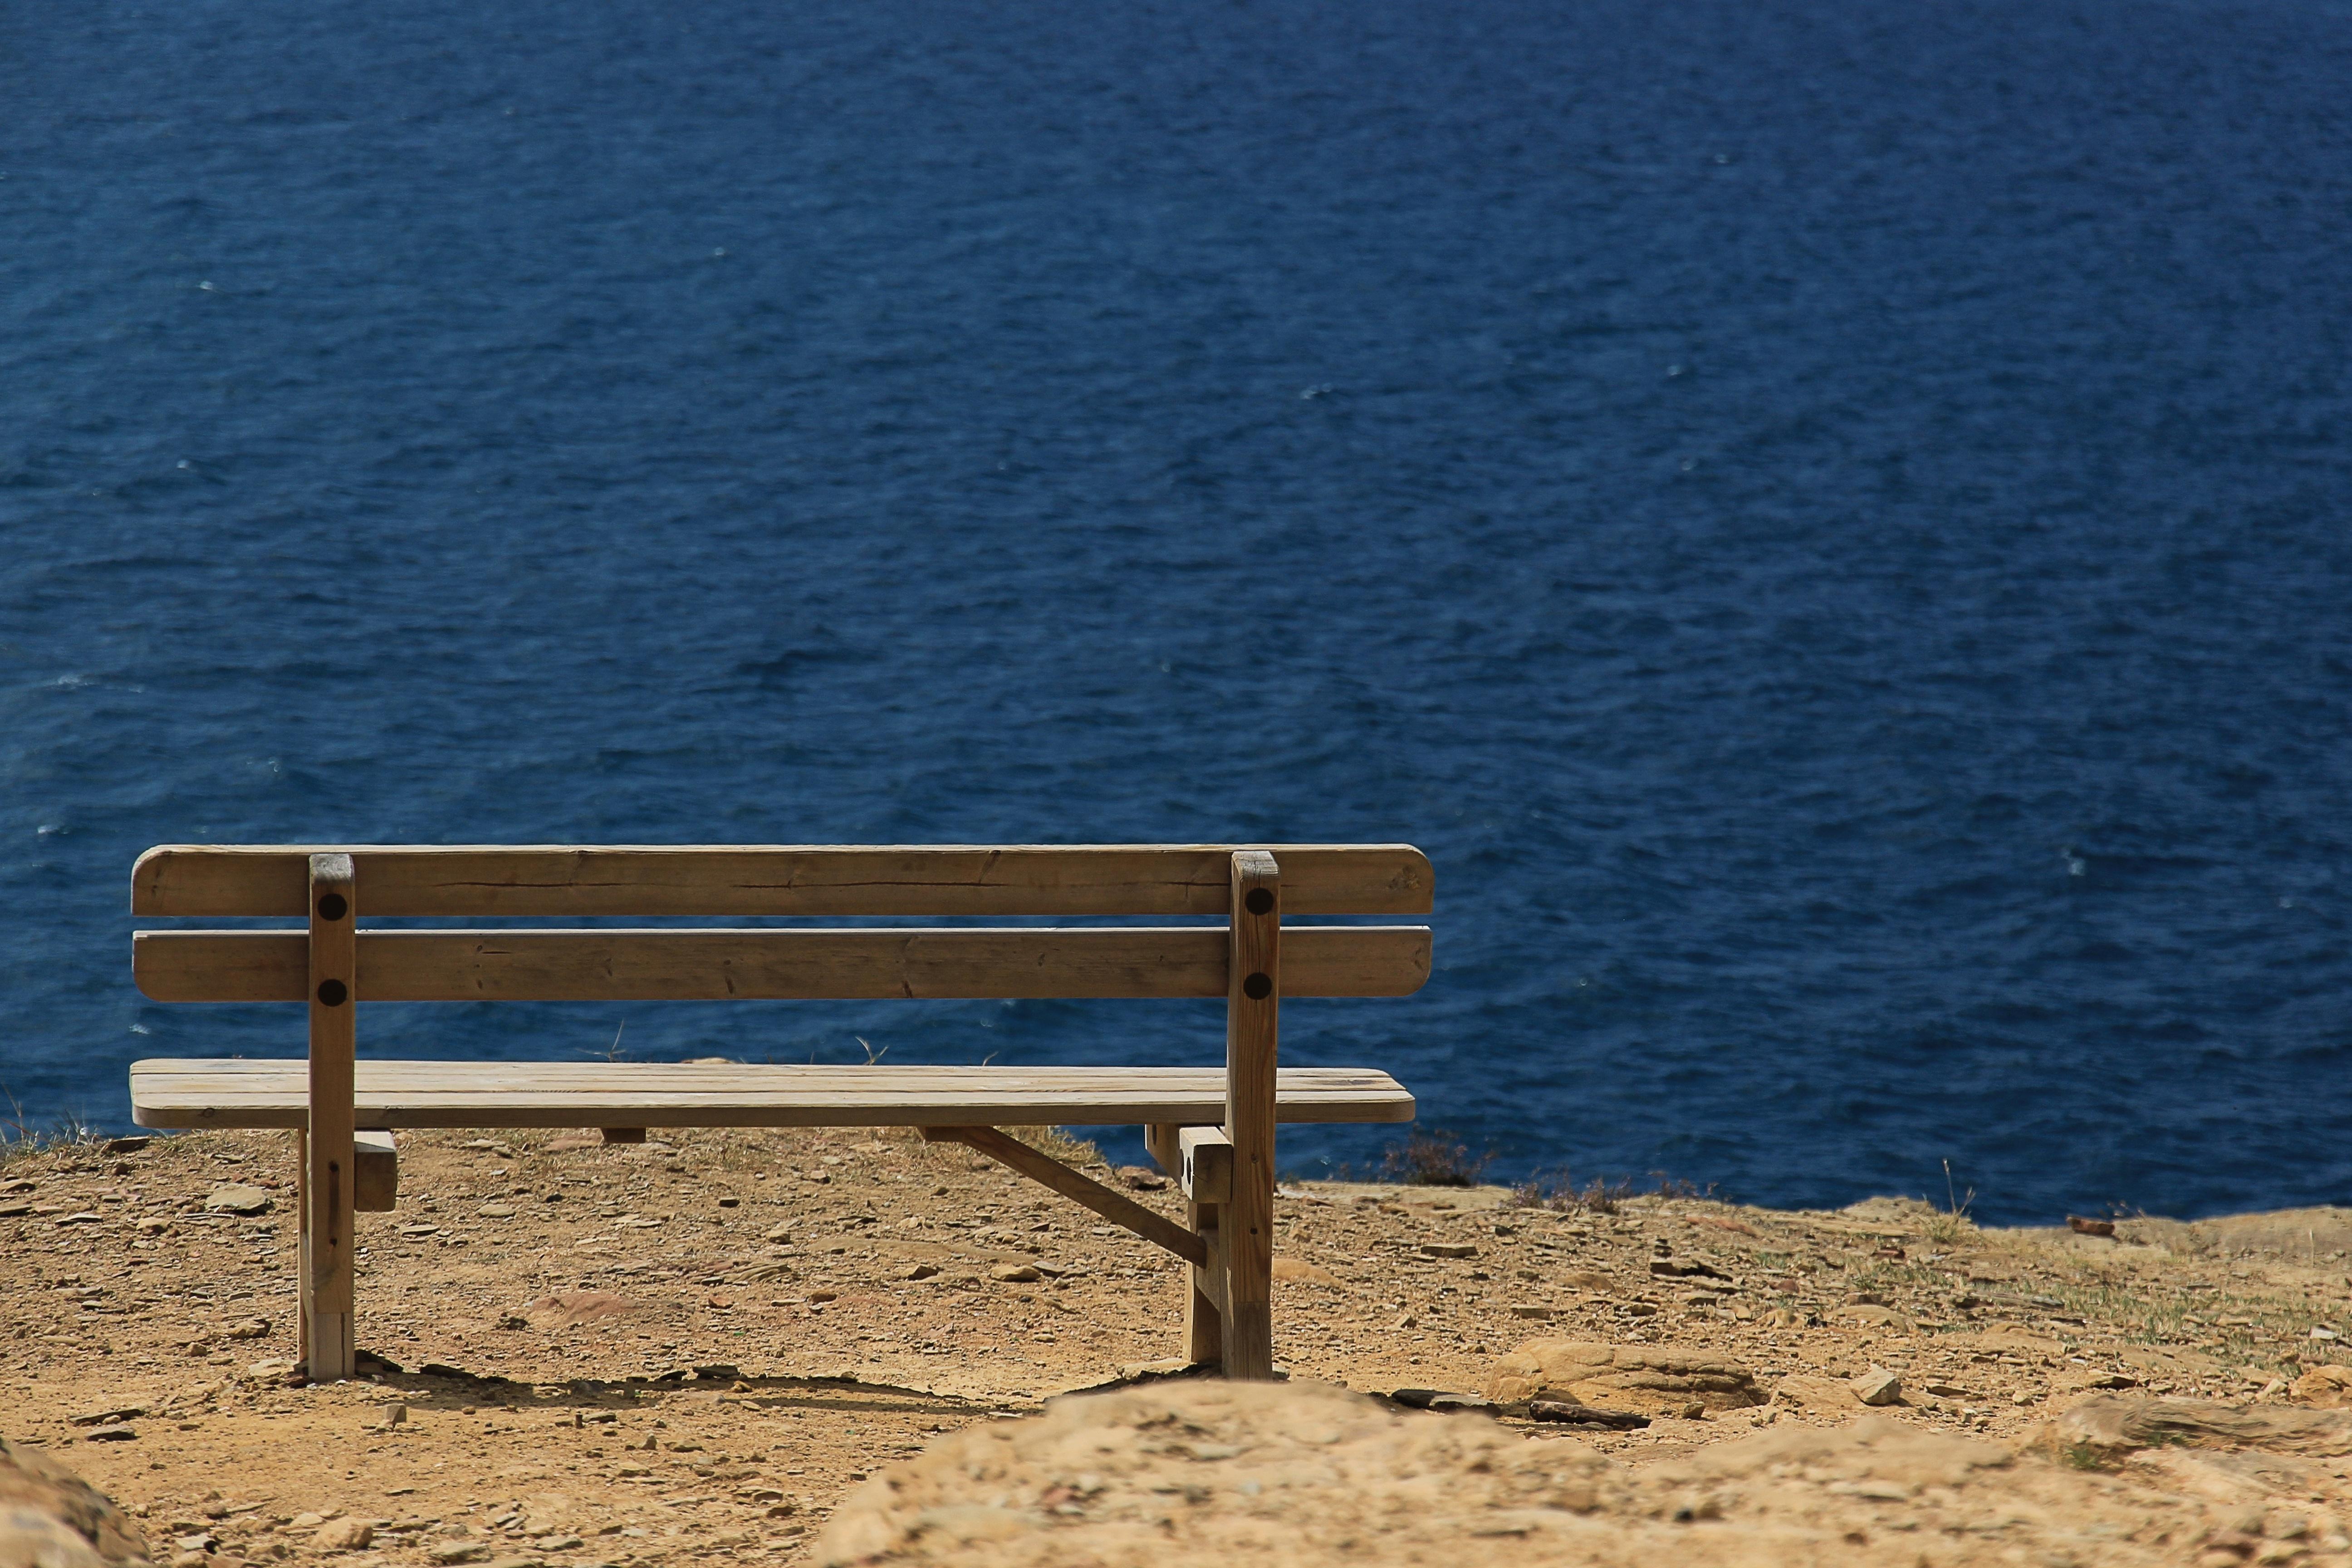 Fotos gratis mesa playa mar agua banco asiento - Mueble banco asiento ...